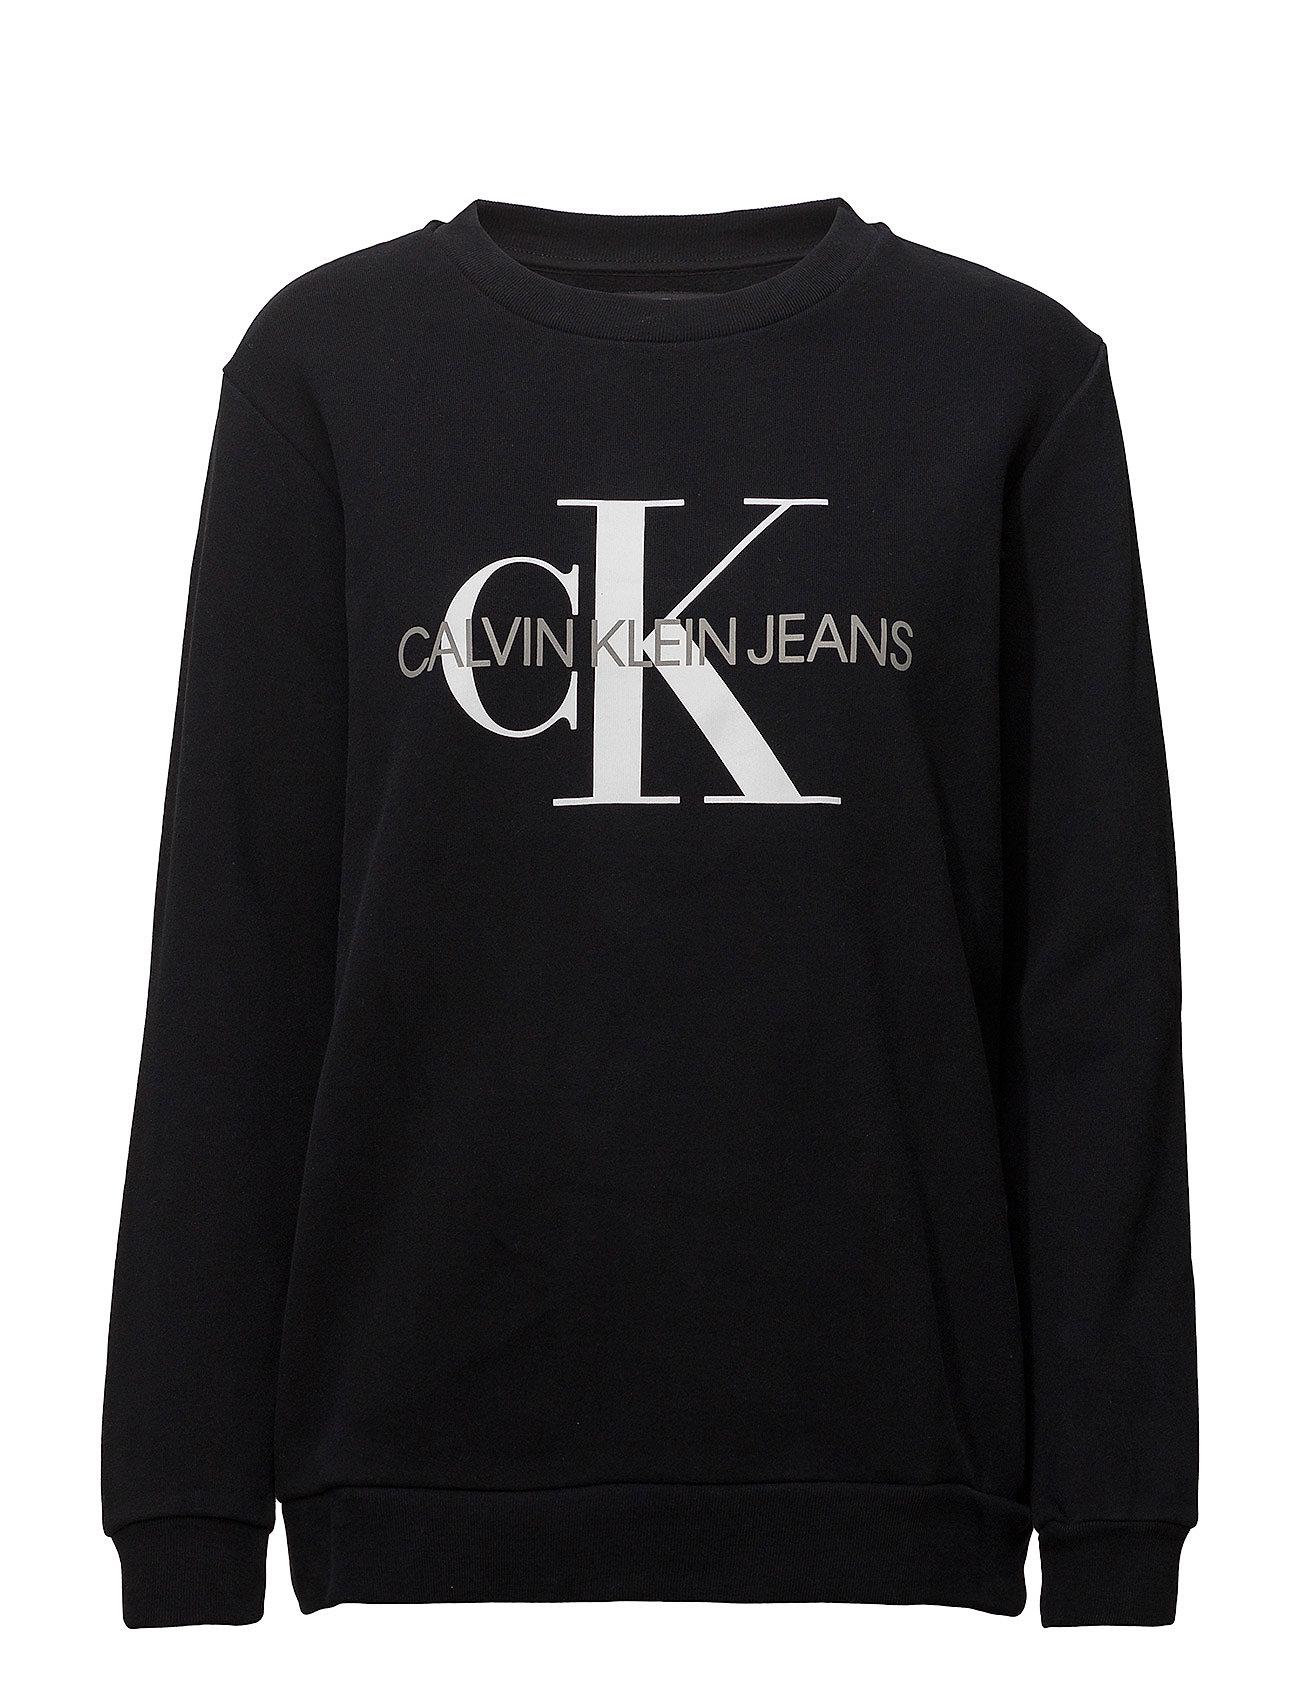 Calvin Klein Jeans CORE MONOGRAM LOGO S - CK BLACK